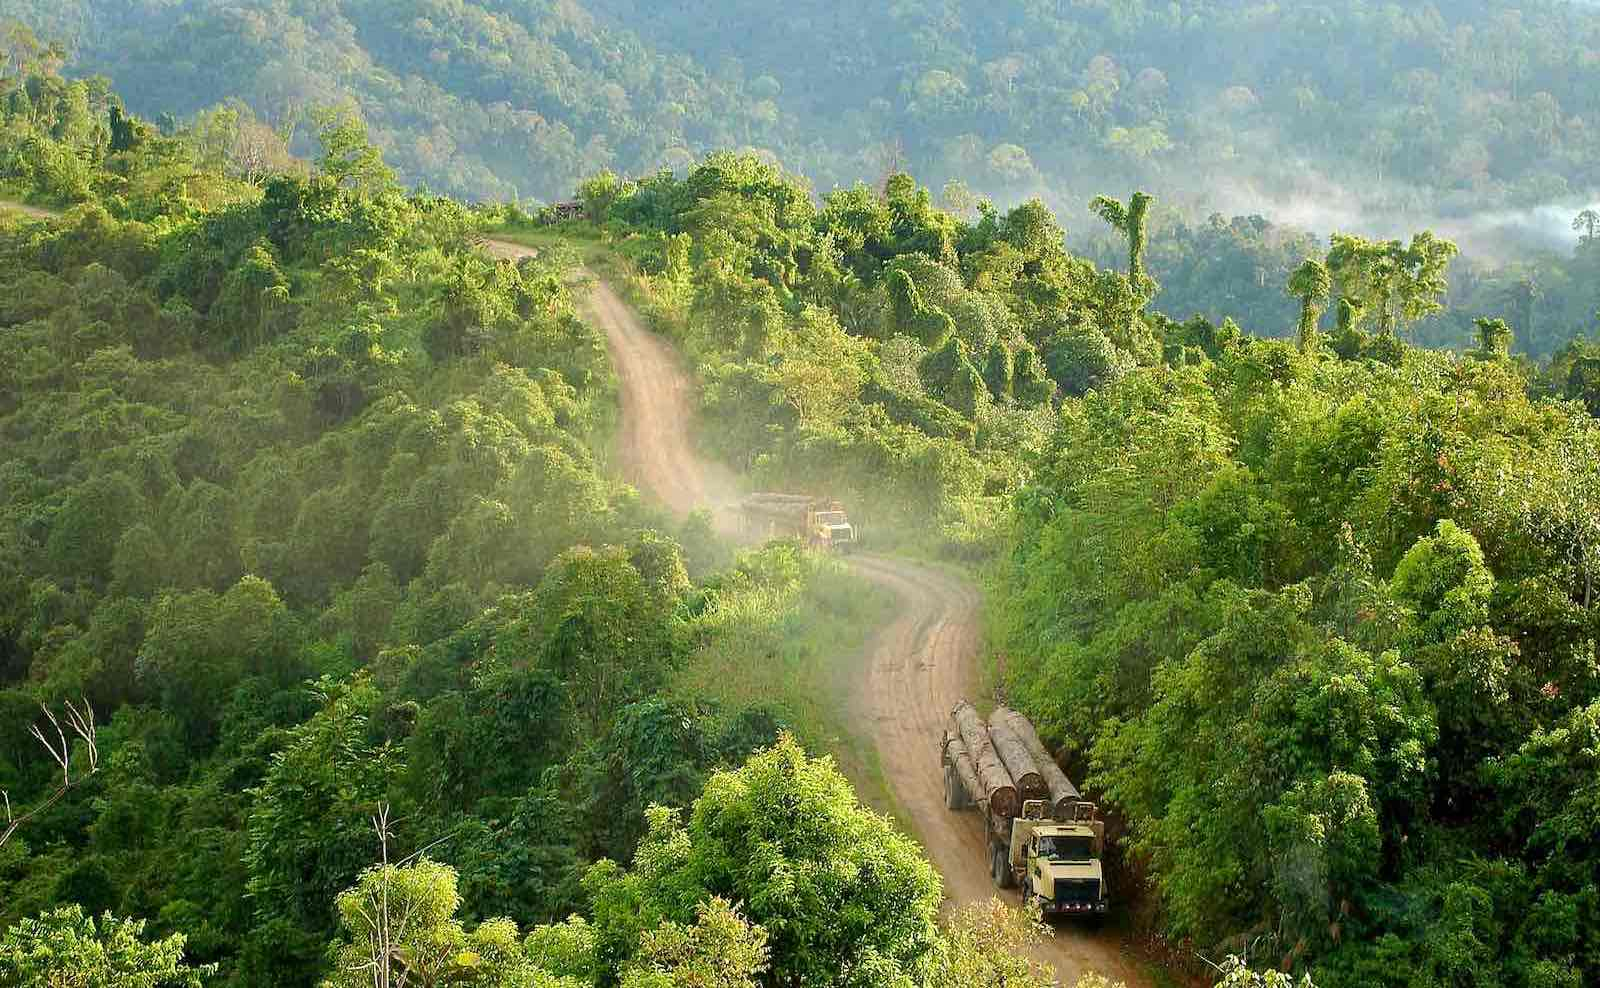 Logging trucks in East Kalimantan, Indonesia (Photo: CIFOR/Flickr)